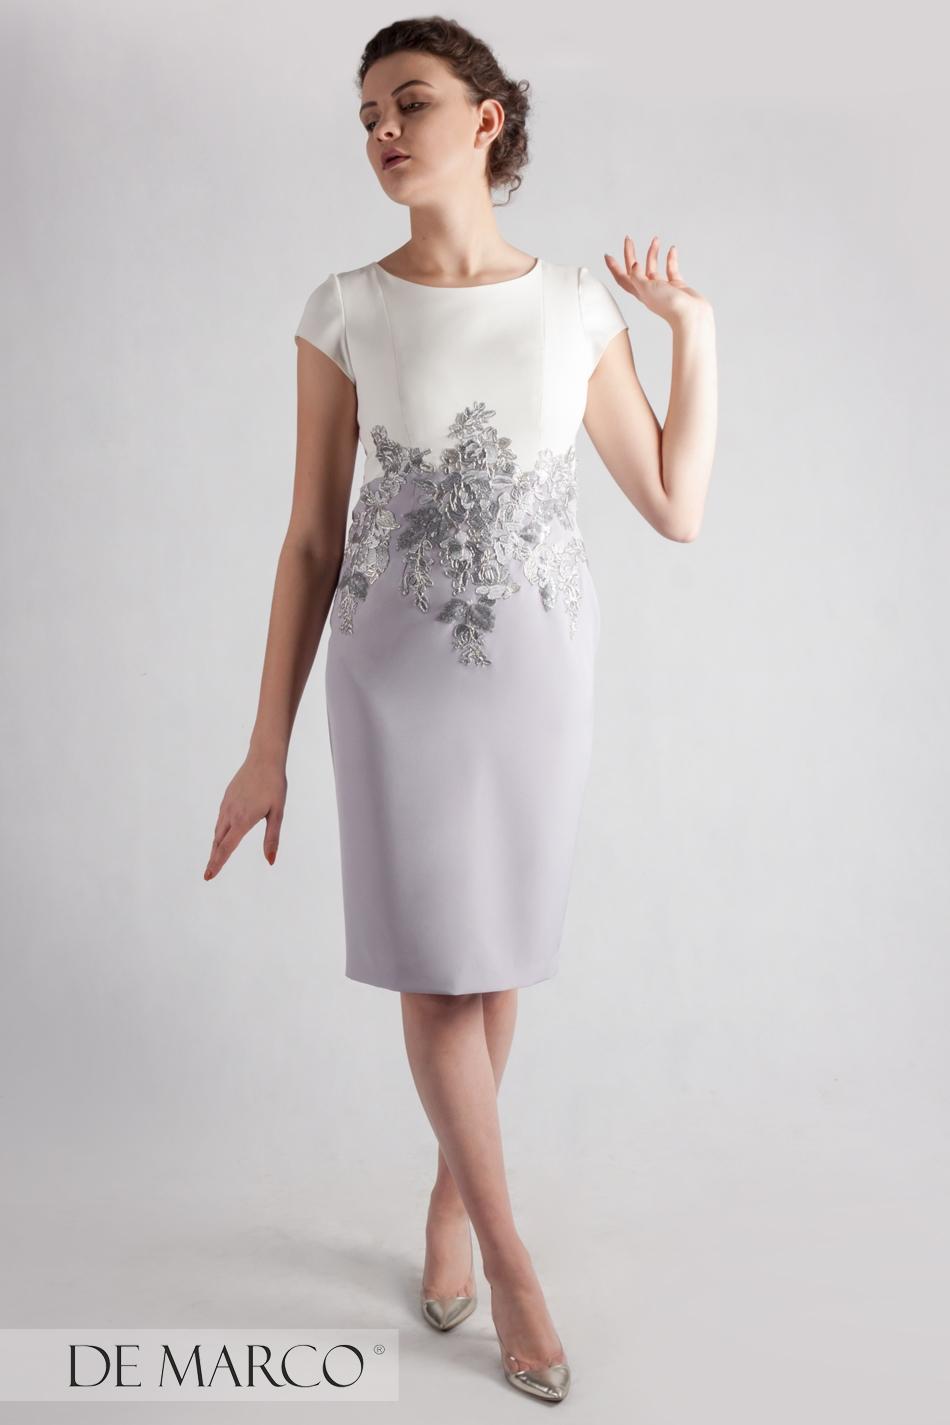 bdd632b83a Idealna Sukienka Na Wesele Dla Mamy Pana Młodego Ryheza Iii